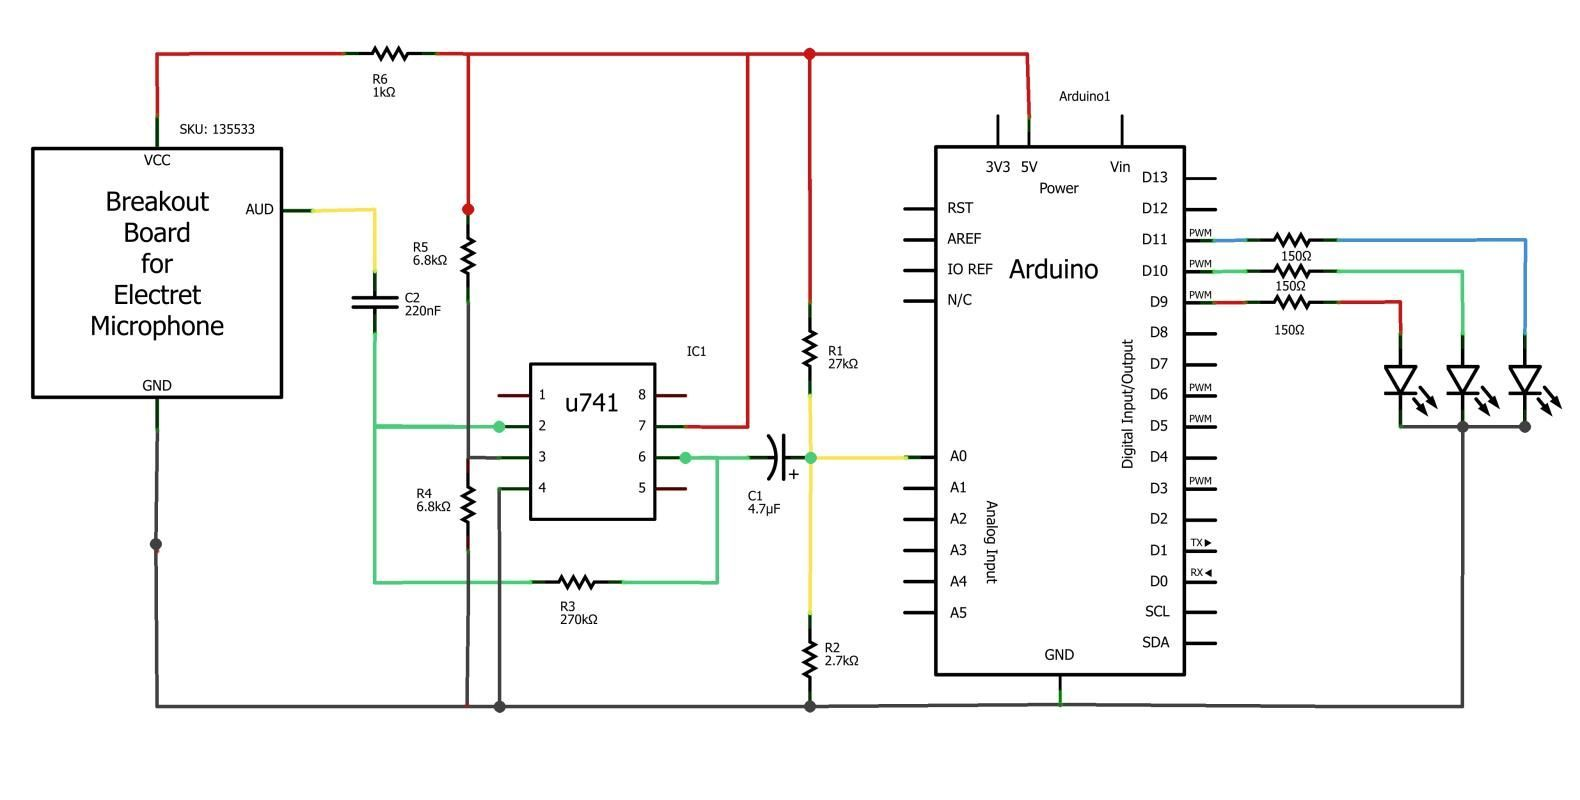 Esquema del organo de luces con Arduino | gustavoserrano | Pinterest ...